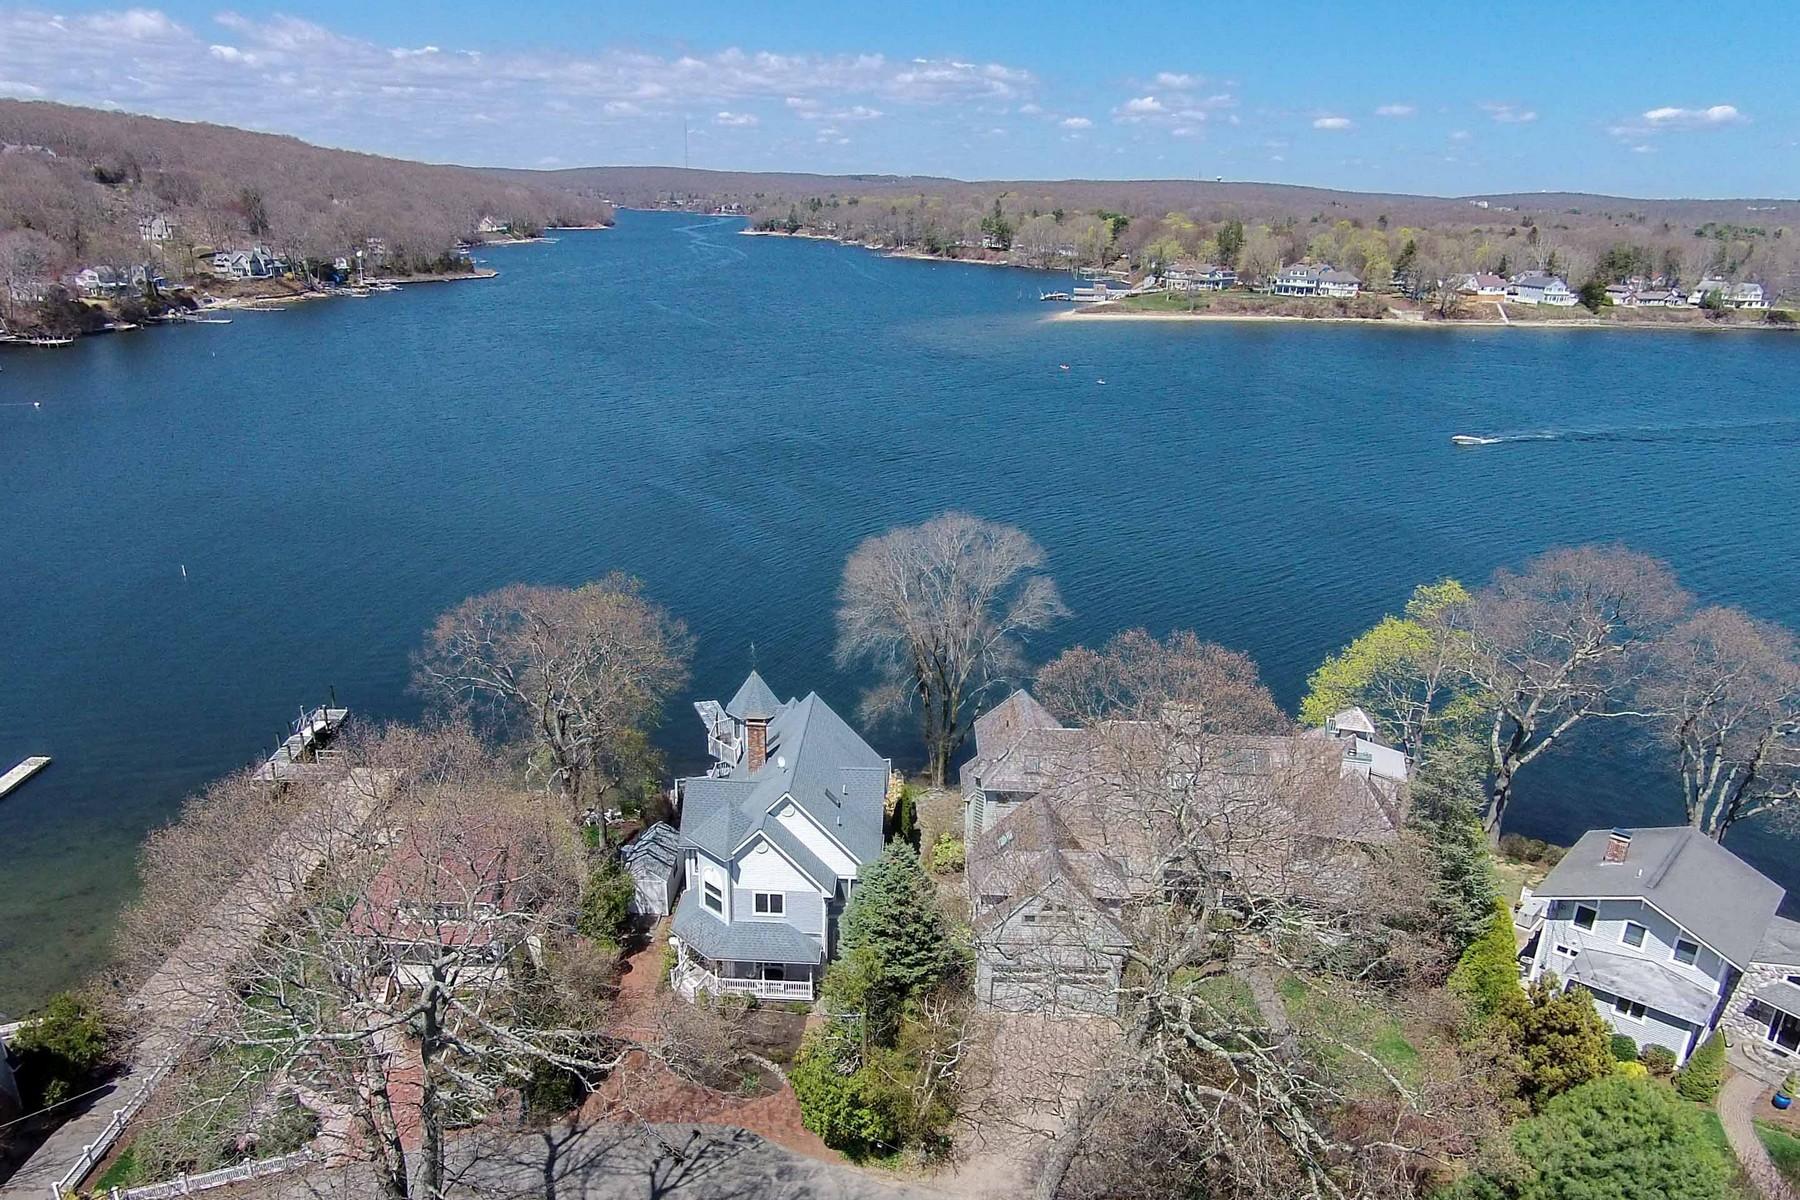 独户住宅 为 销售 在 A Water Lover's Dream 28 Bishops Bay Road 东莱姆, 康涅狄格州, 06357 美国